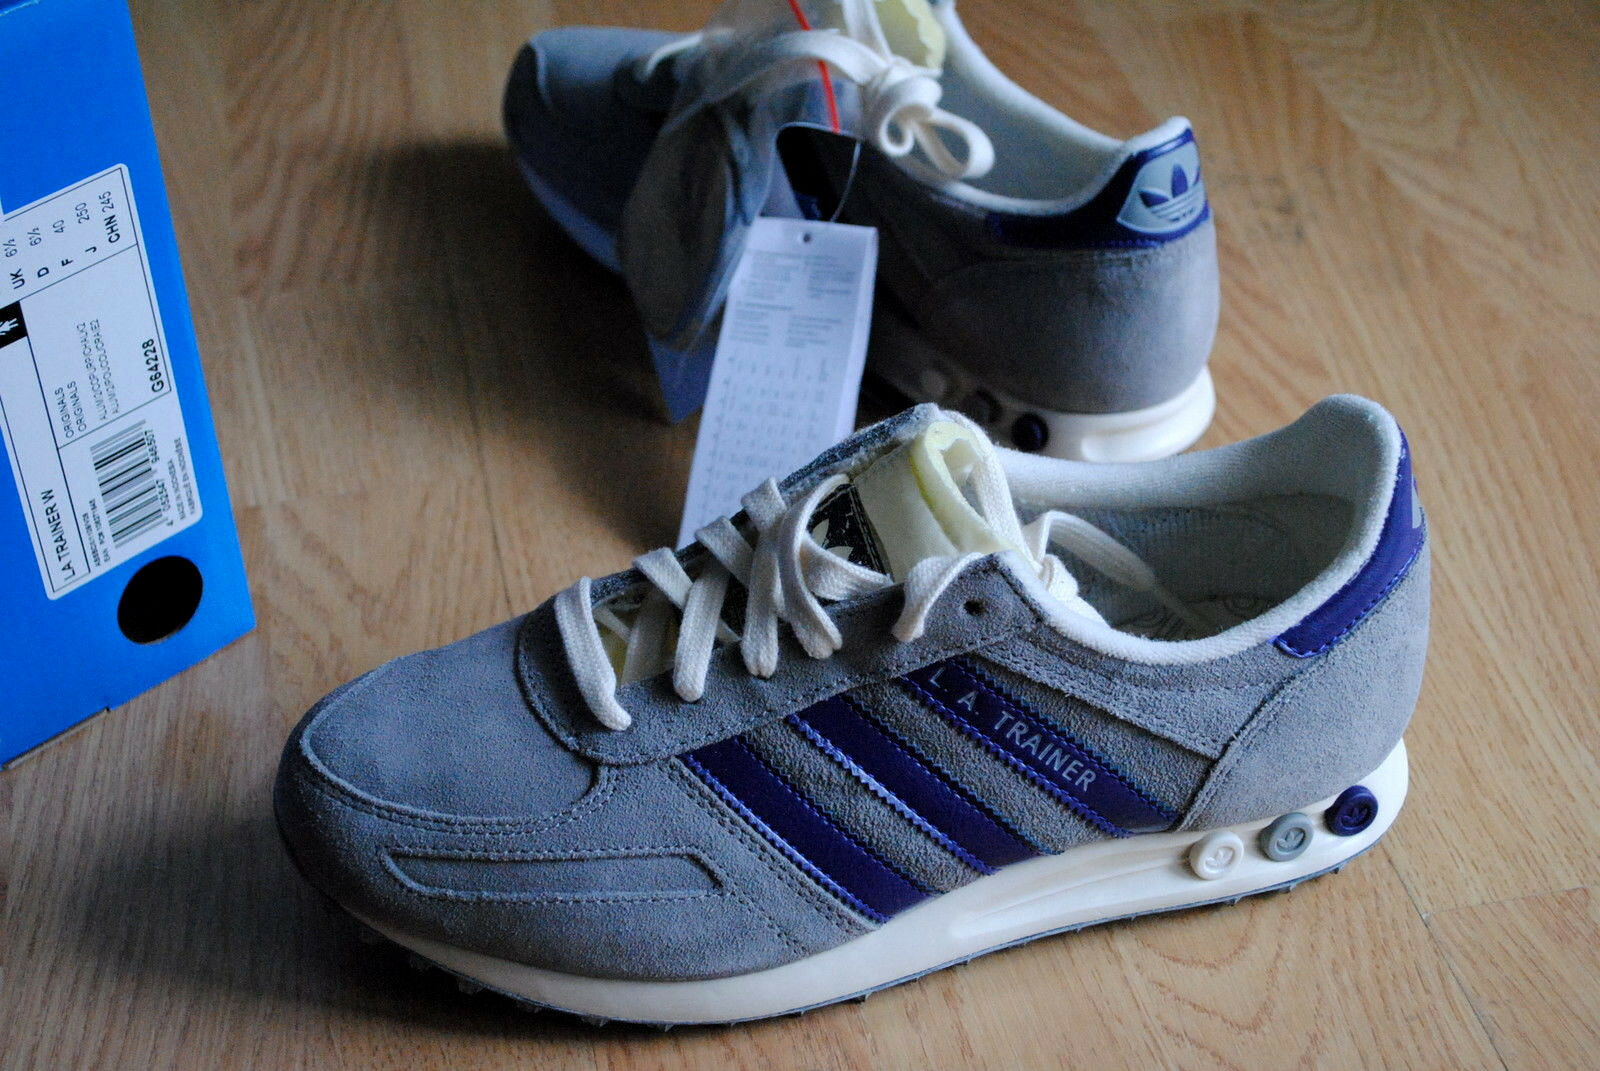 Adidas La Trainer W 36 37 38 38,5 39 40 Vintage Zx Flux Superstar Los Angeles